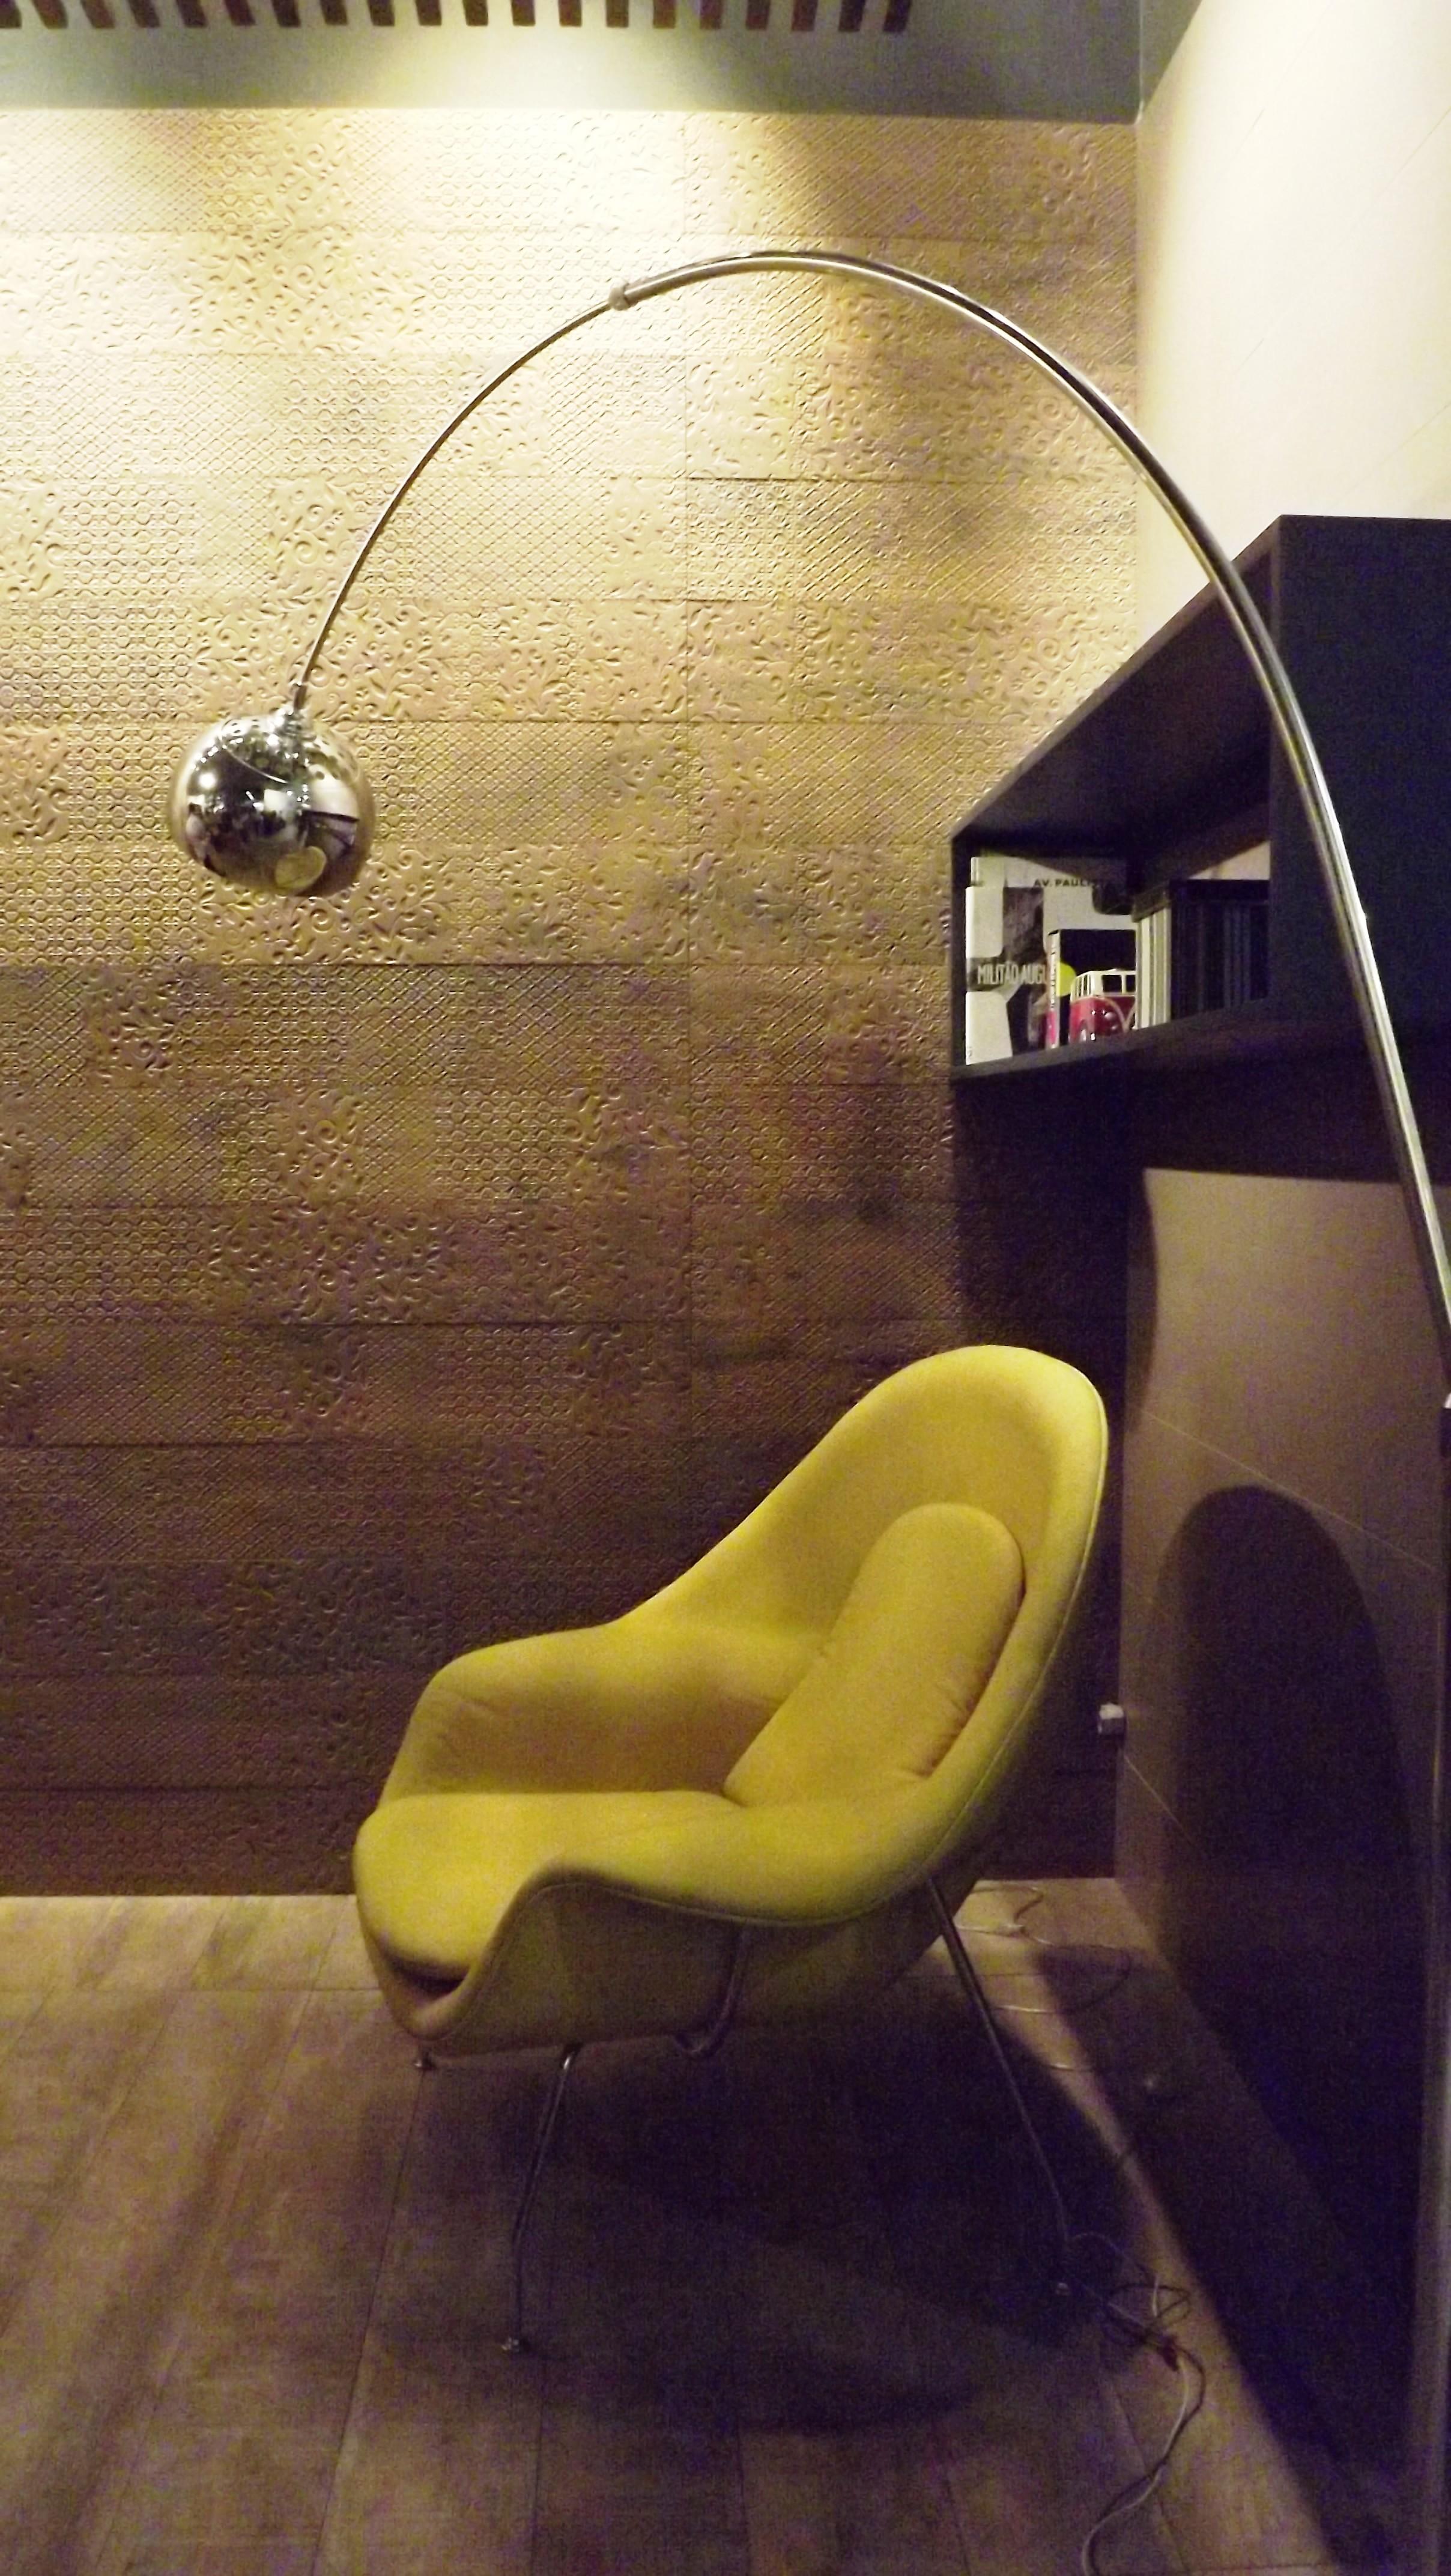 Arbo HD - Carvalho HD Decor ACT - Maravilhoso para destacar paredes!!!!